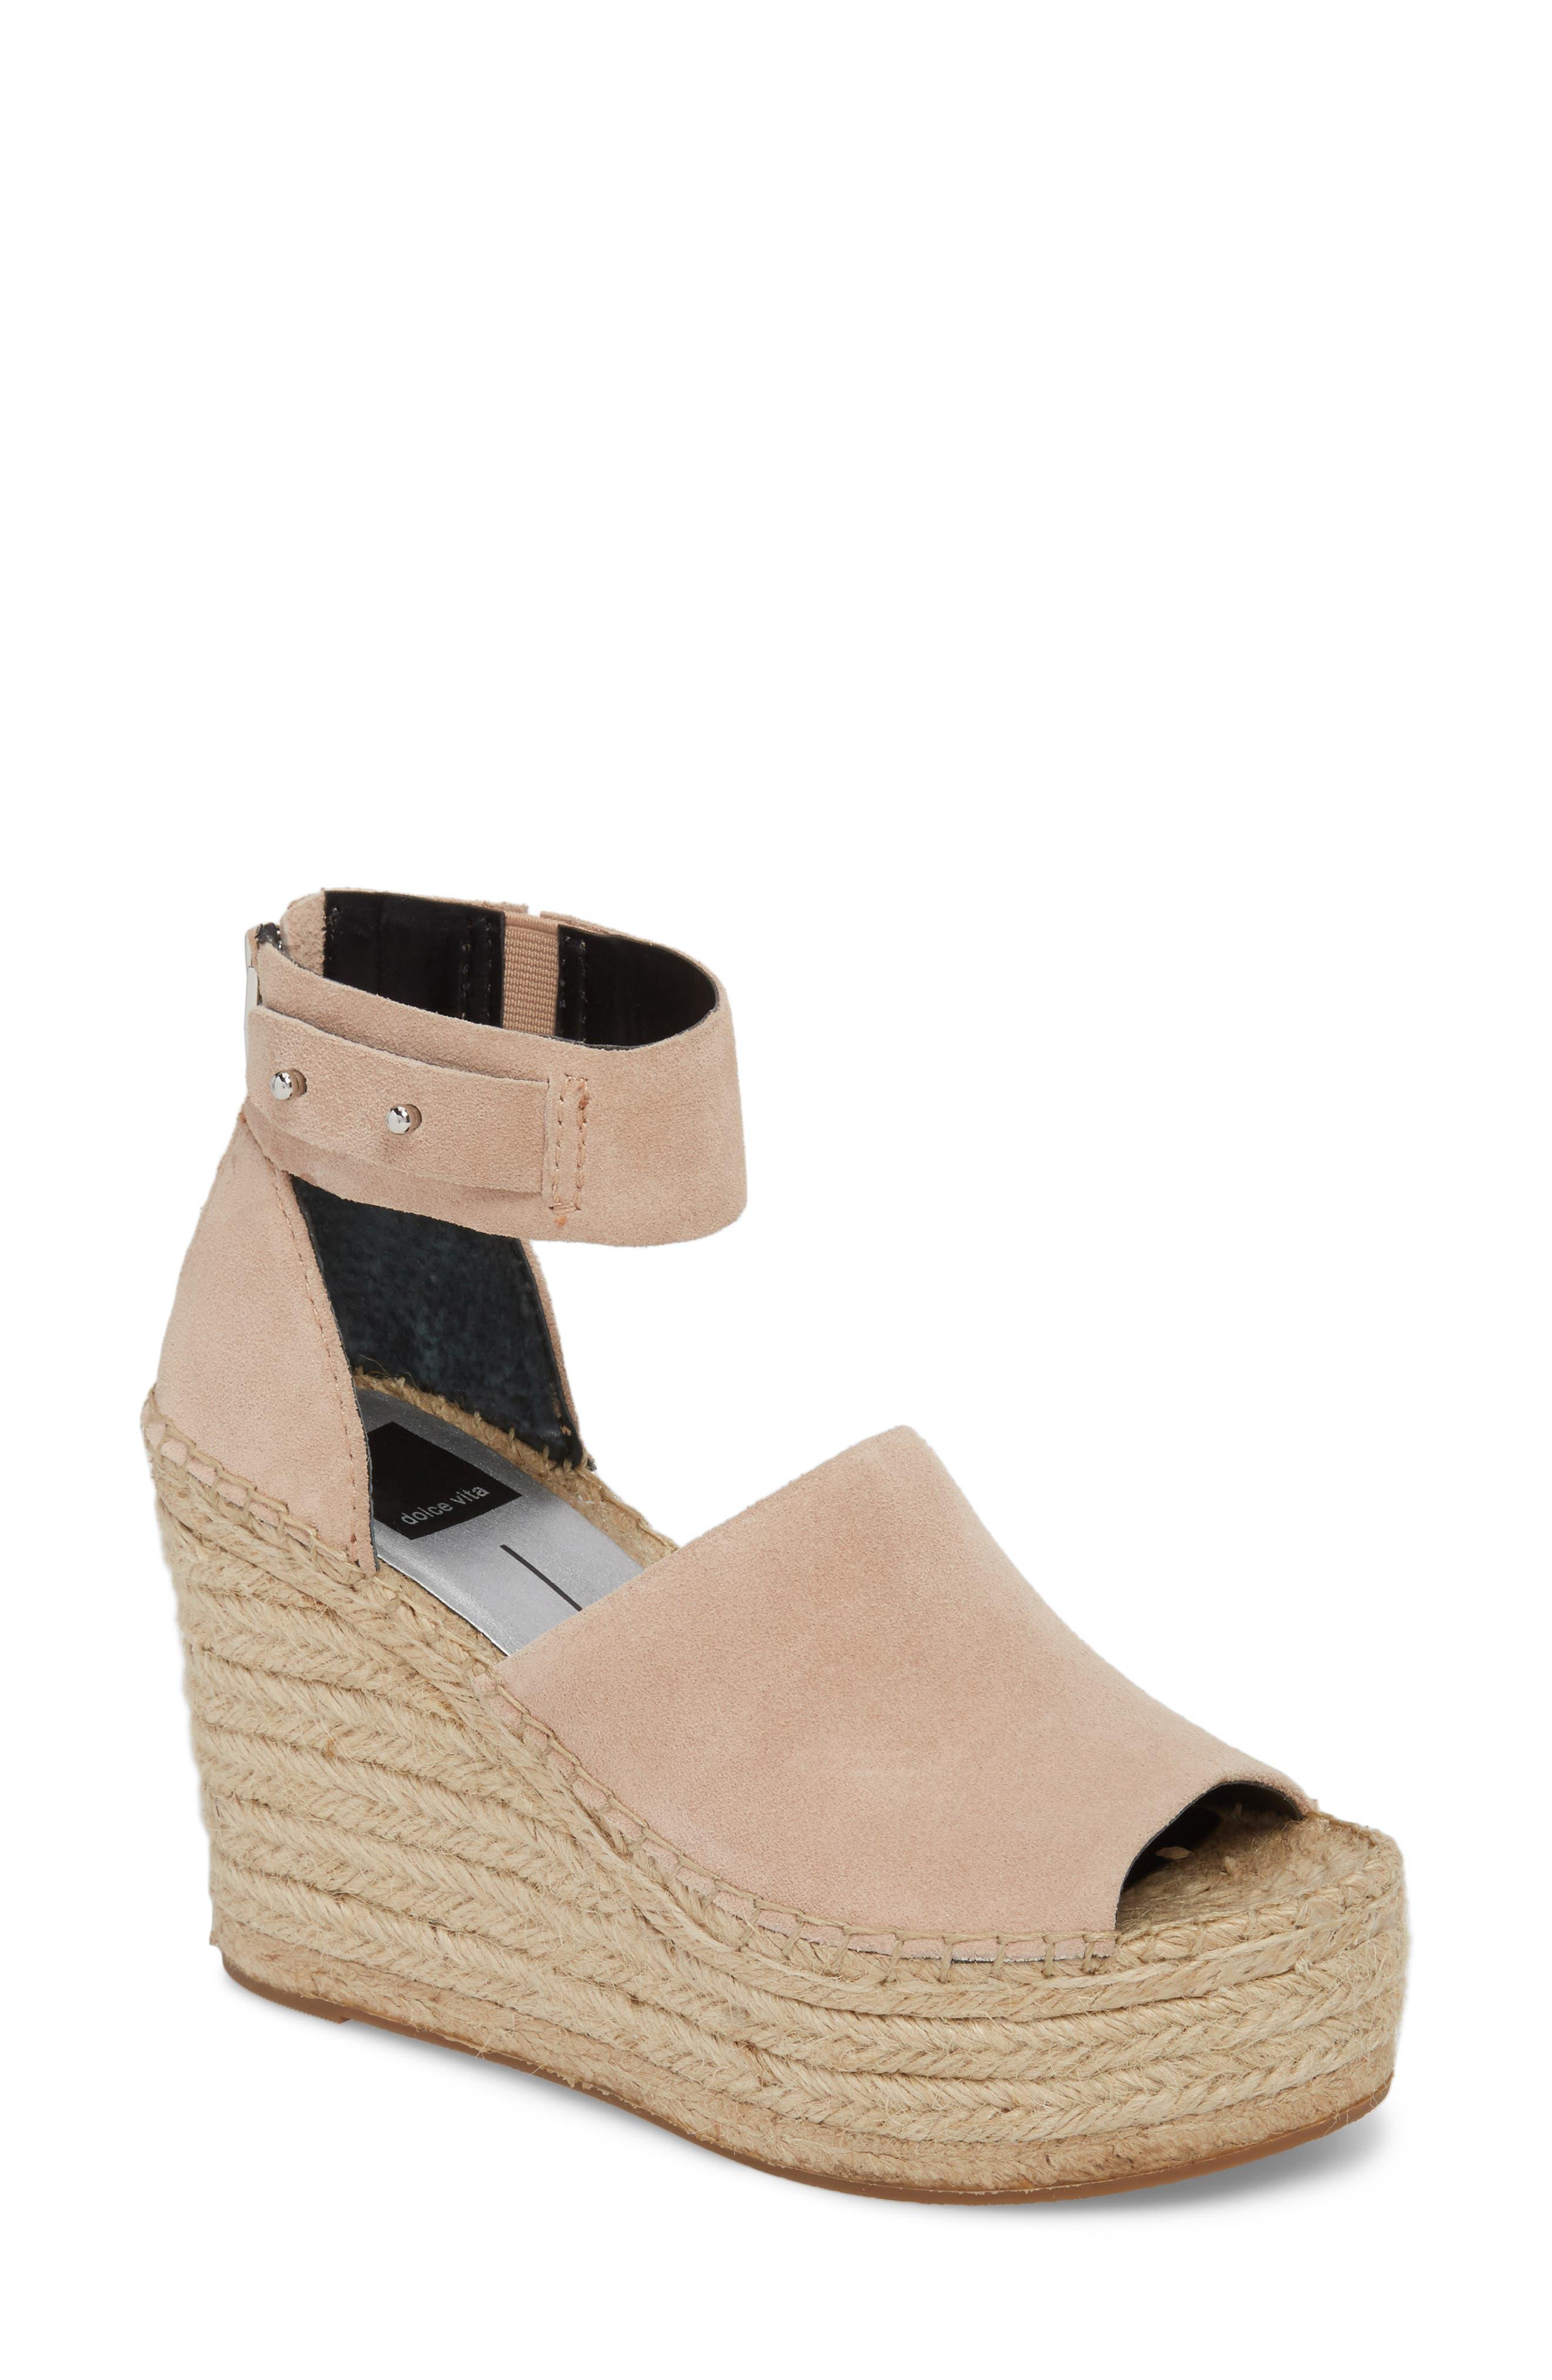 Alternate Image 1 Selected - Dolce Vita Straw Wedge Espadrille Sandal (Women)